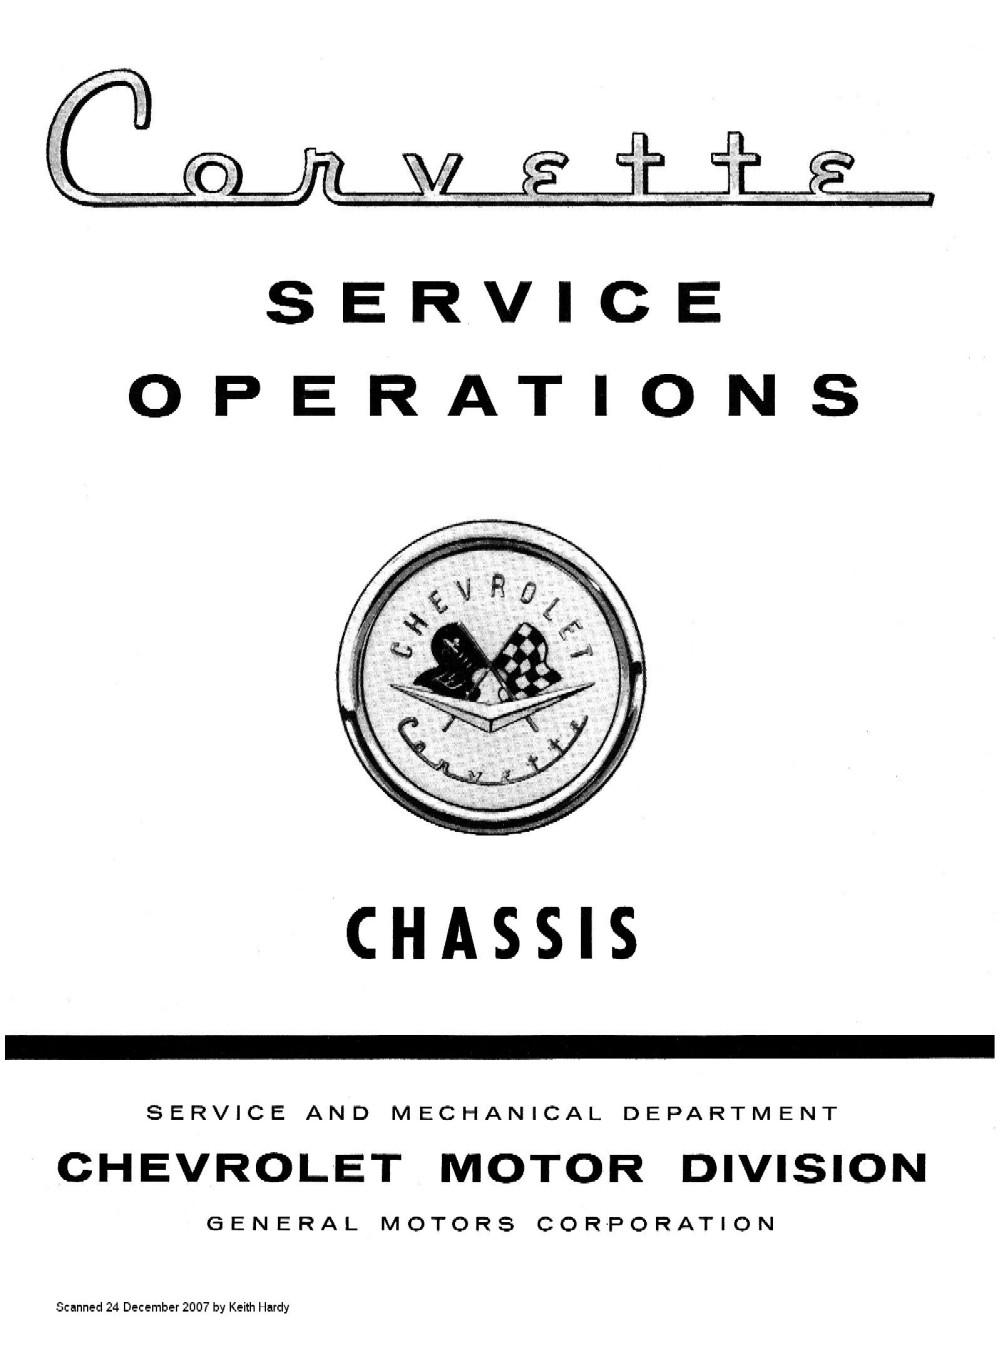 1957 Corvette Service Operations